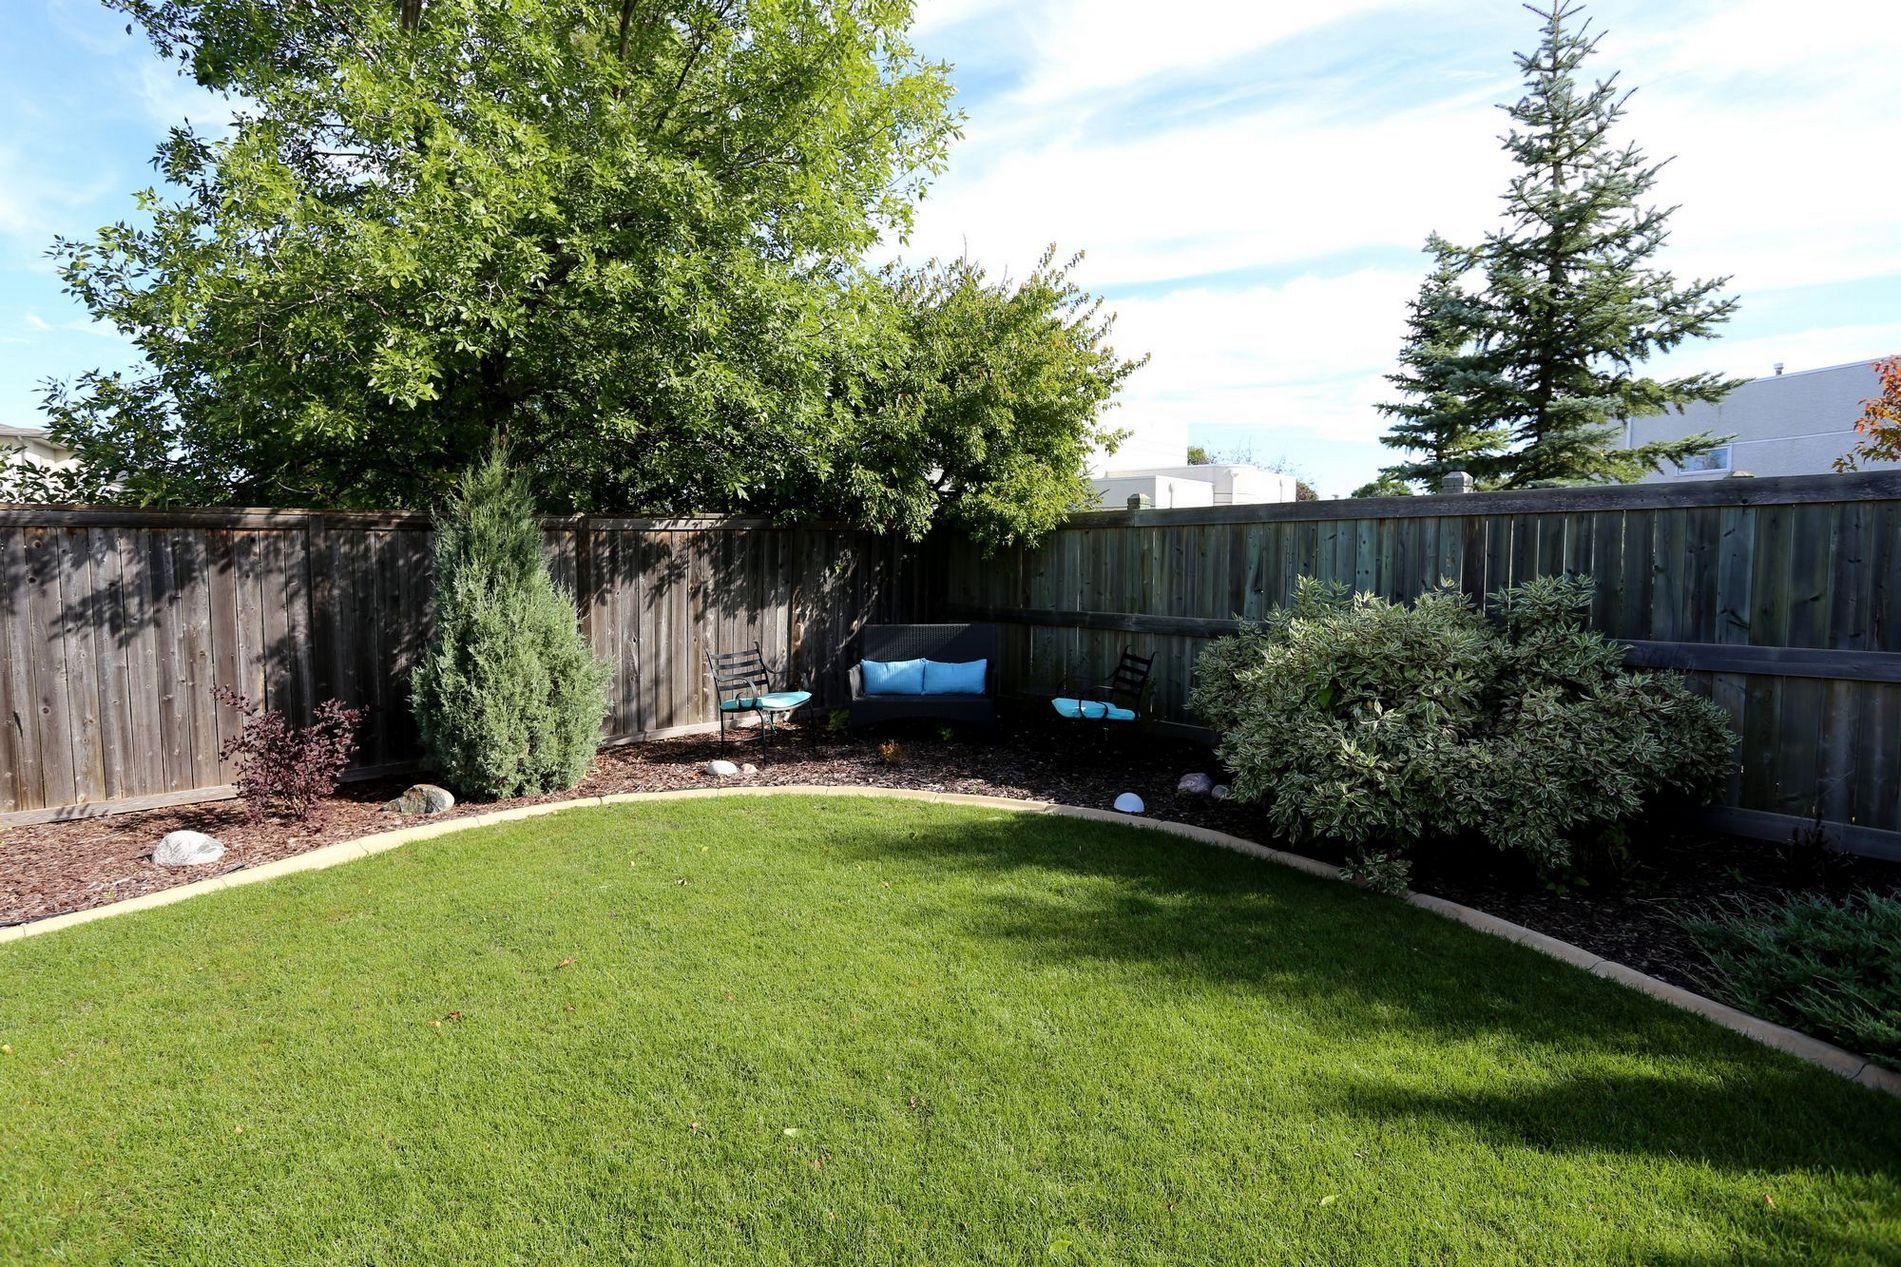 65 Litchfield Blvd, Winnipeg, Manitoba  R3P 2J4 - Photo 28 - 1526222